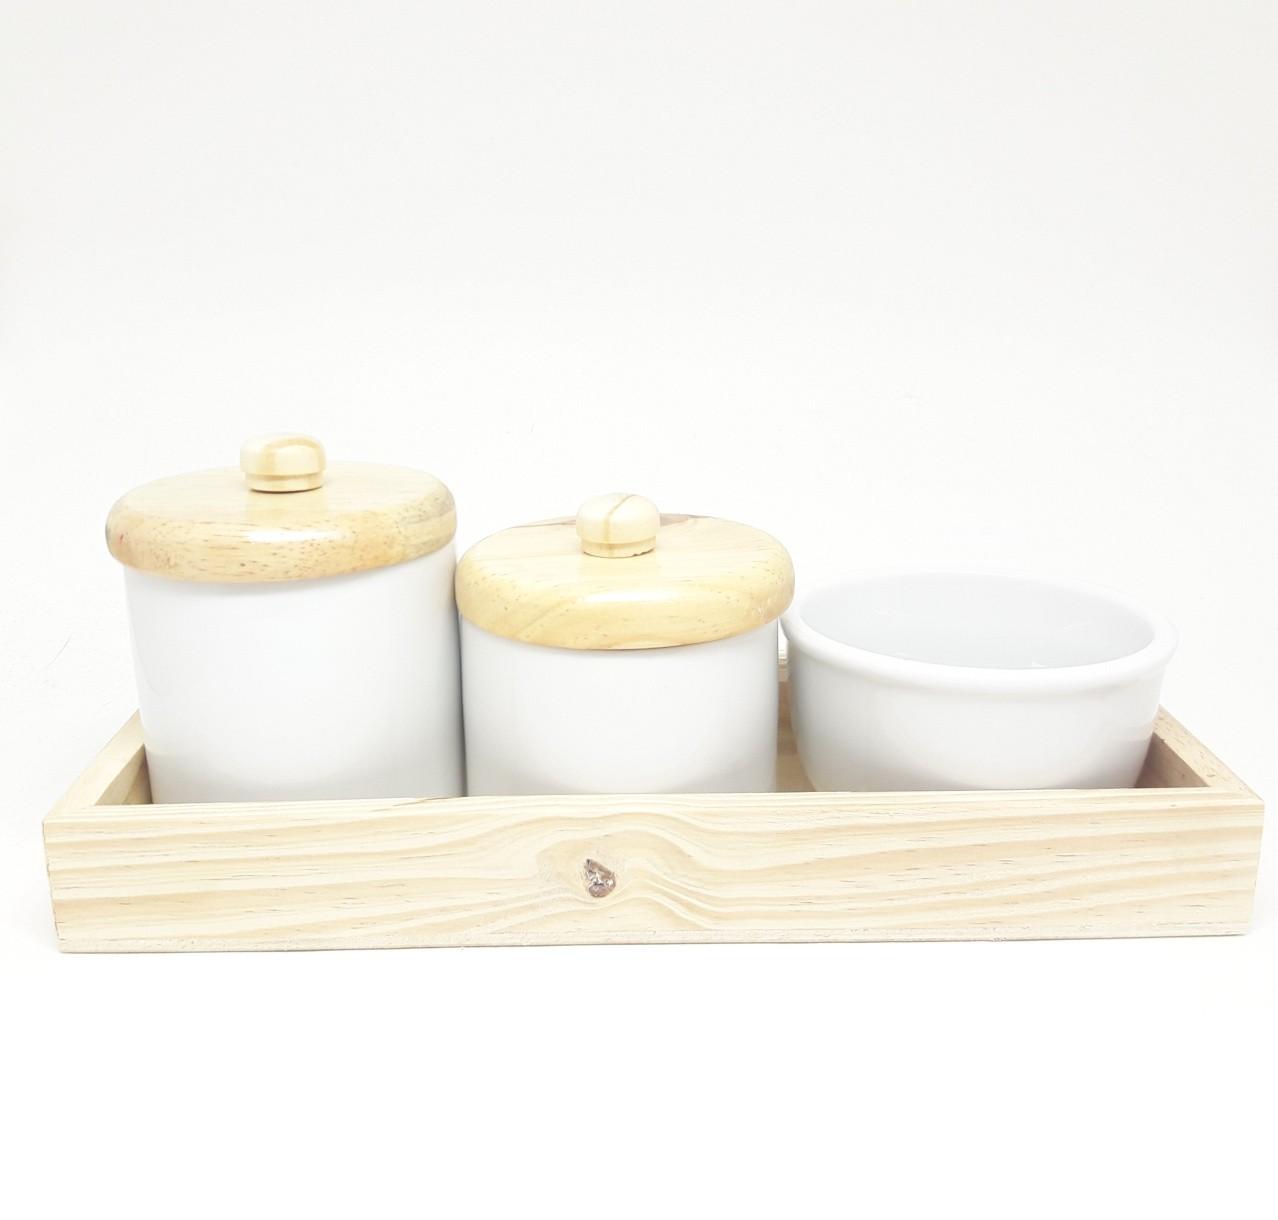 Kit higiene bebê porcelana pinus com bandeja rústica